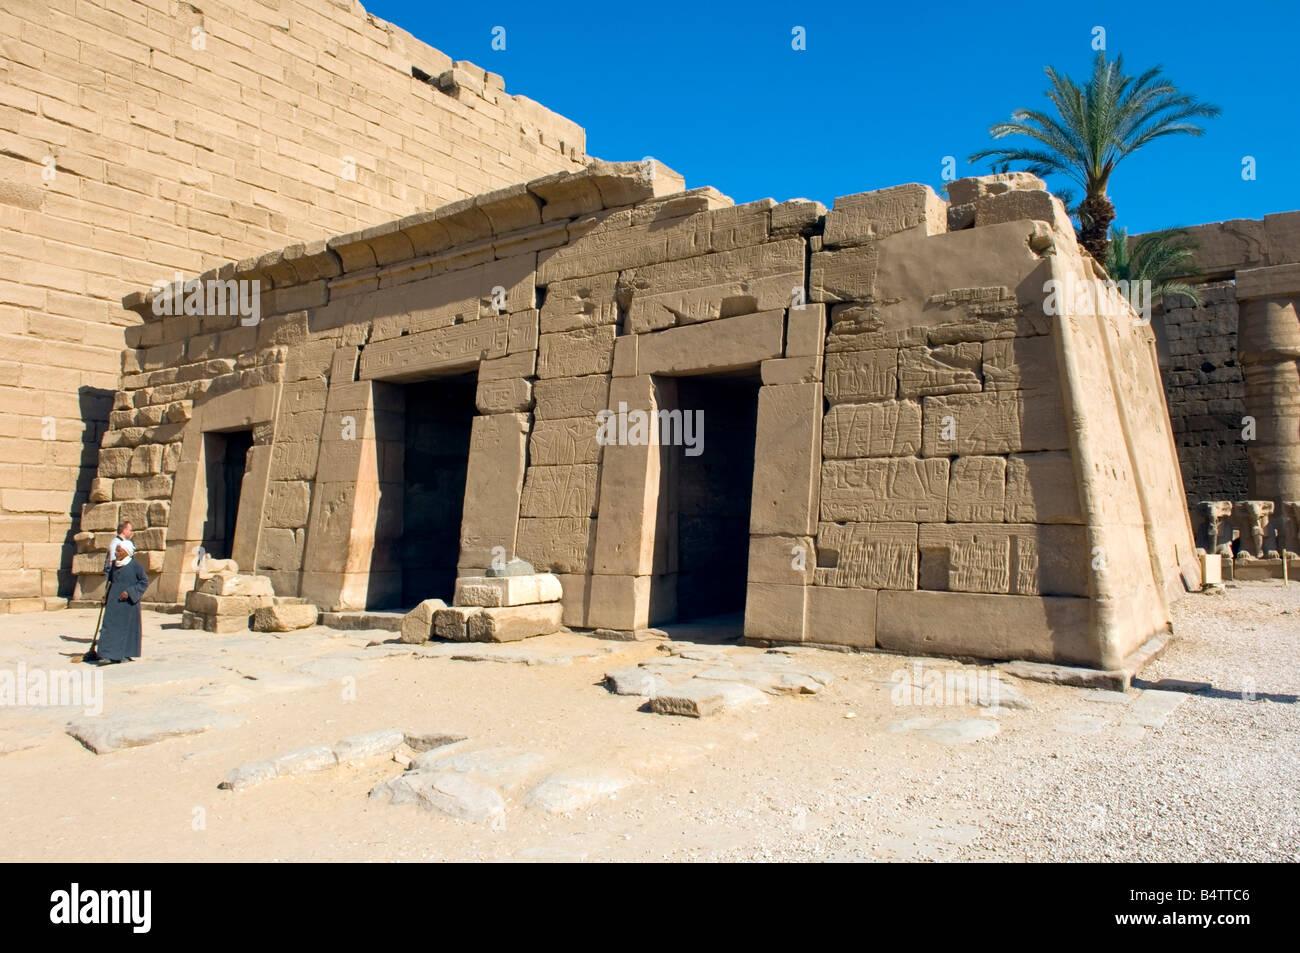 The barque chapel of Seti II, Karnak Temple Complex, UNESCO World Heritage Site, Luxor, Egypt Stock Photo